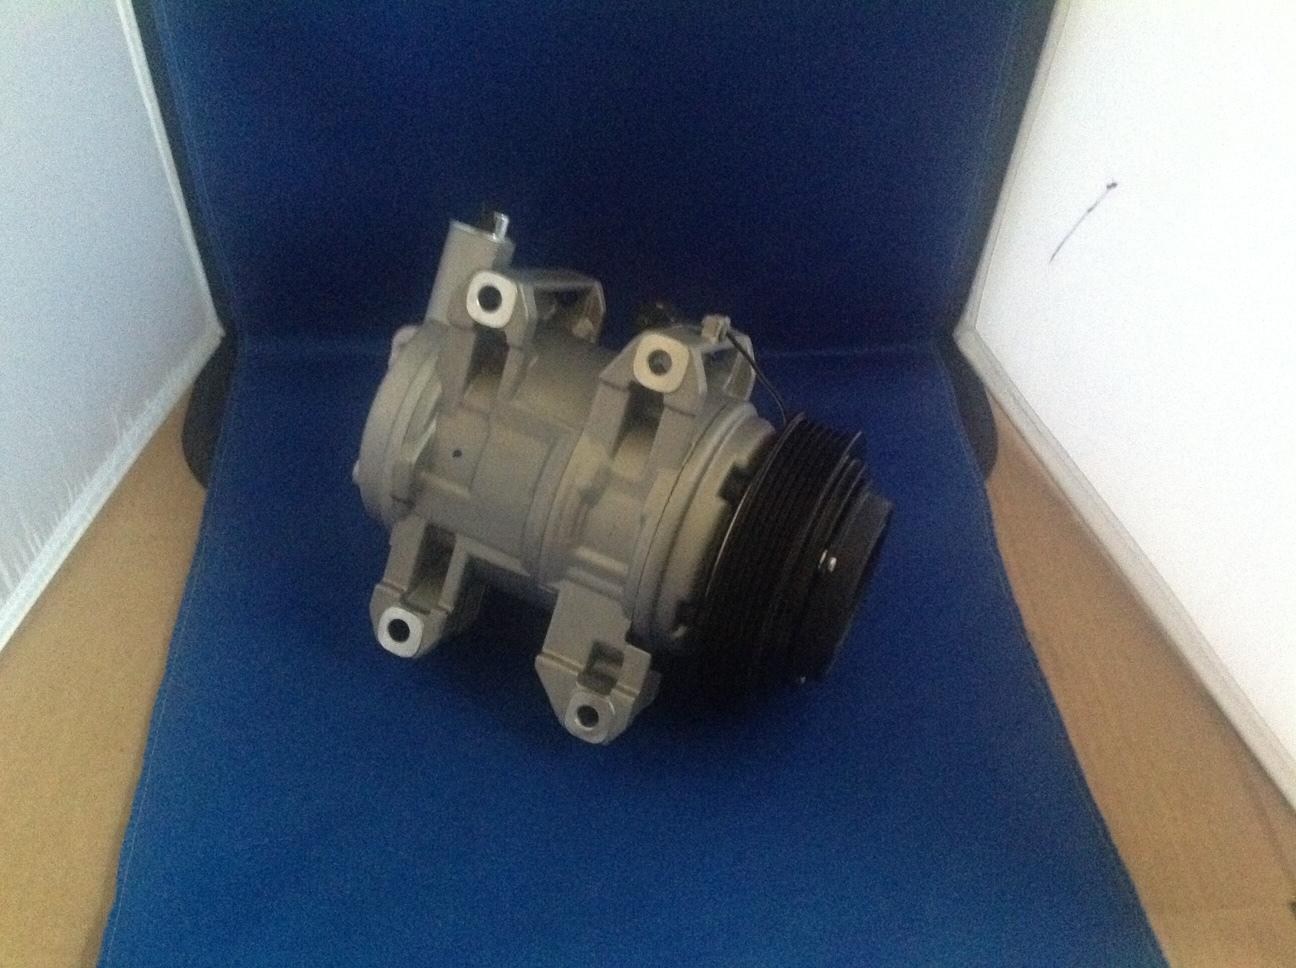 02-06 Nissan Altima 2.5 Auto AC Air Conditioning Compressor Repair Part Kit